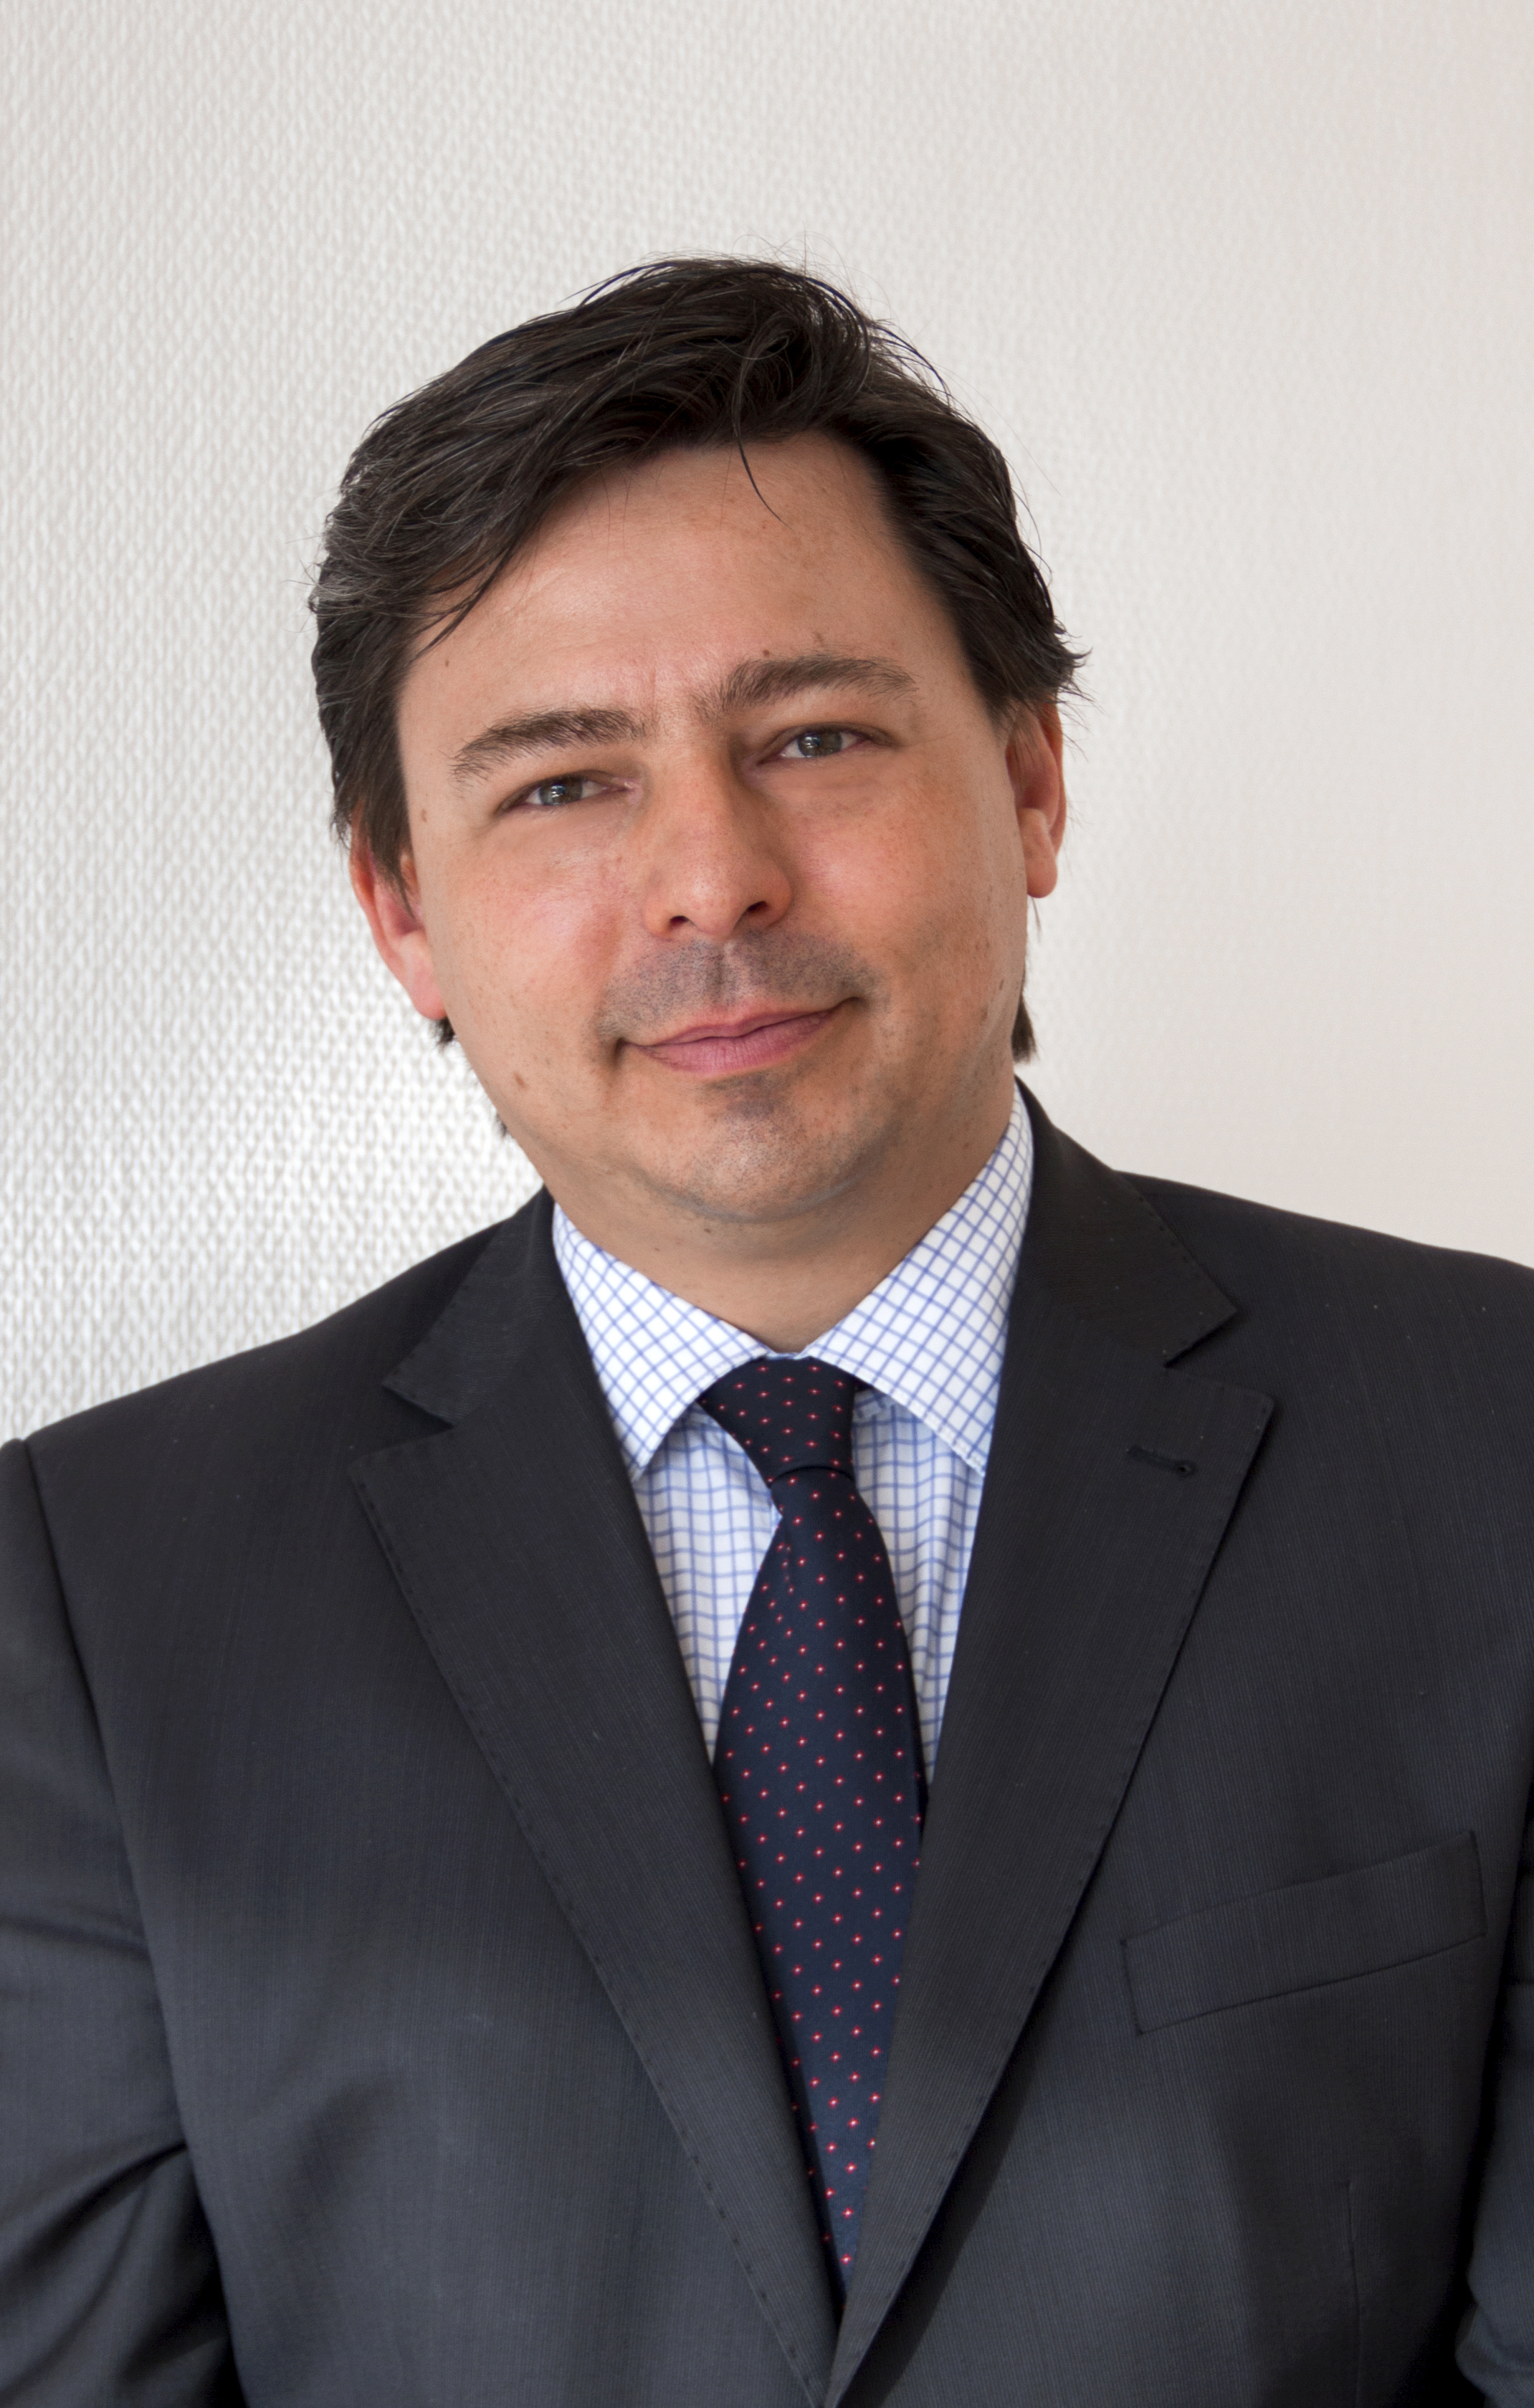 Udo Paniczek